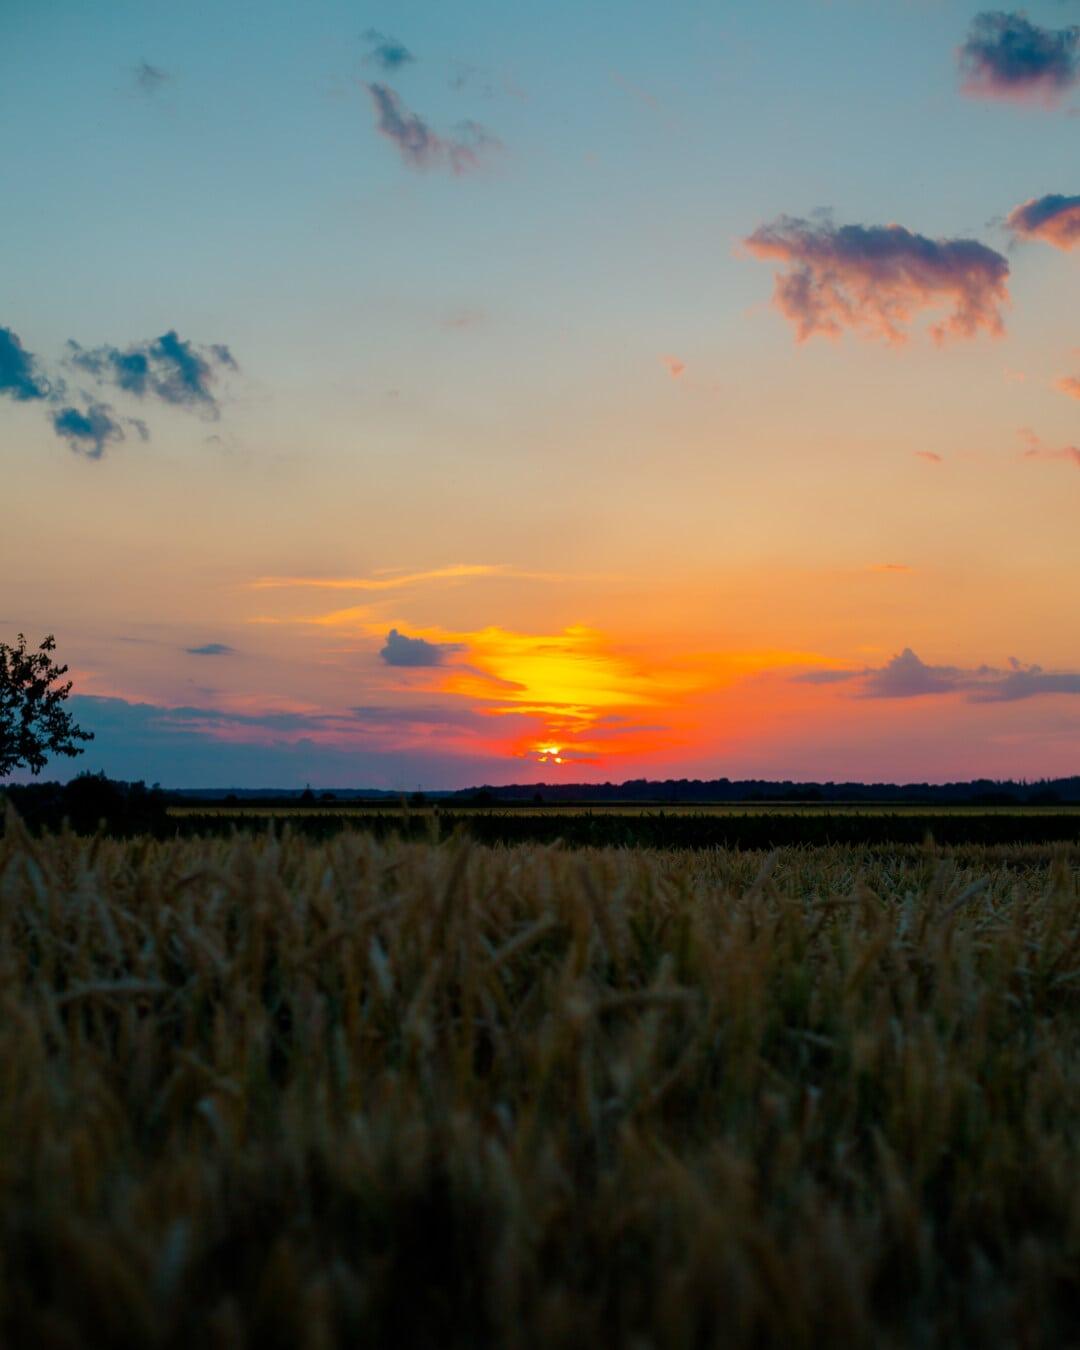 wheatfield, wheat, atmosphere, sunset, majestic, star, dawn, landscape, sun, countryside